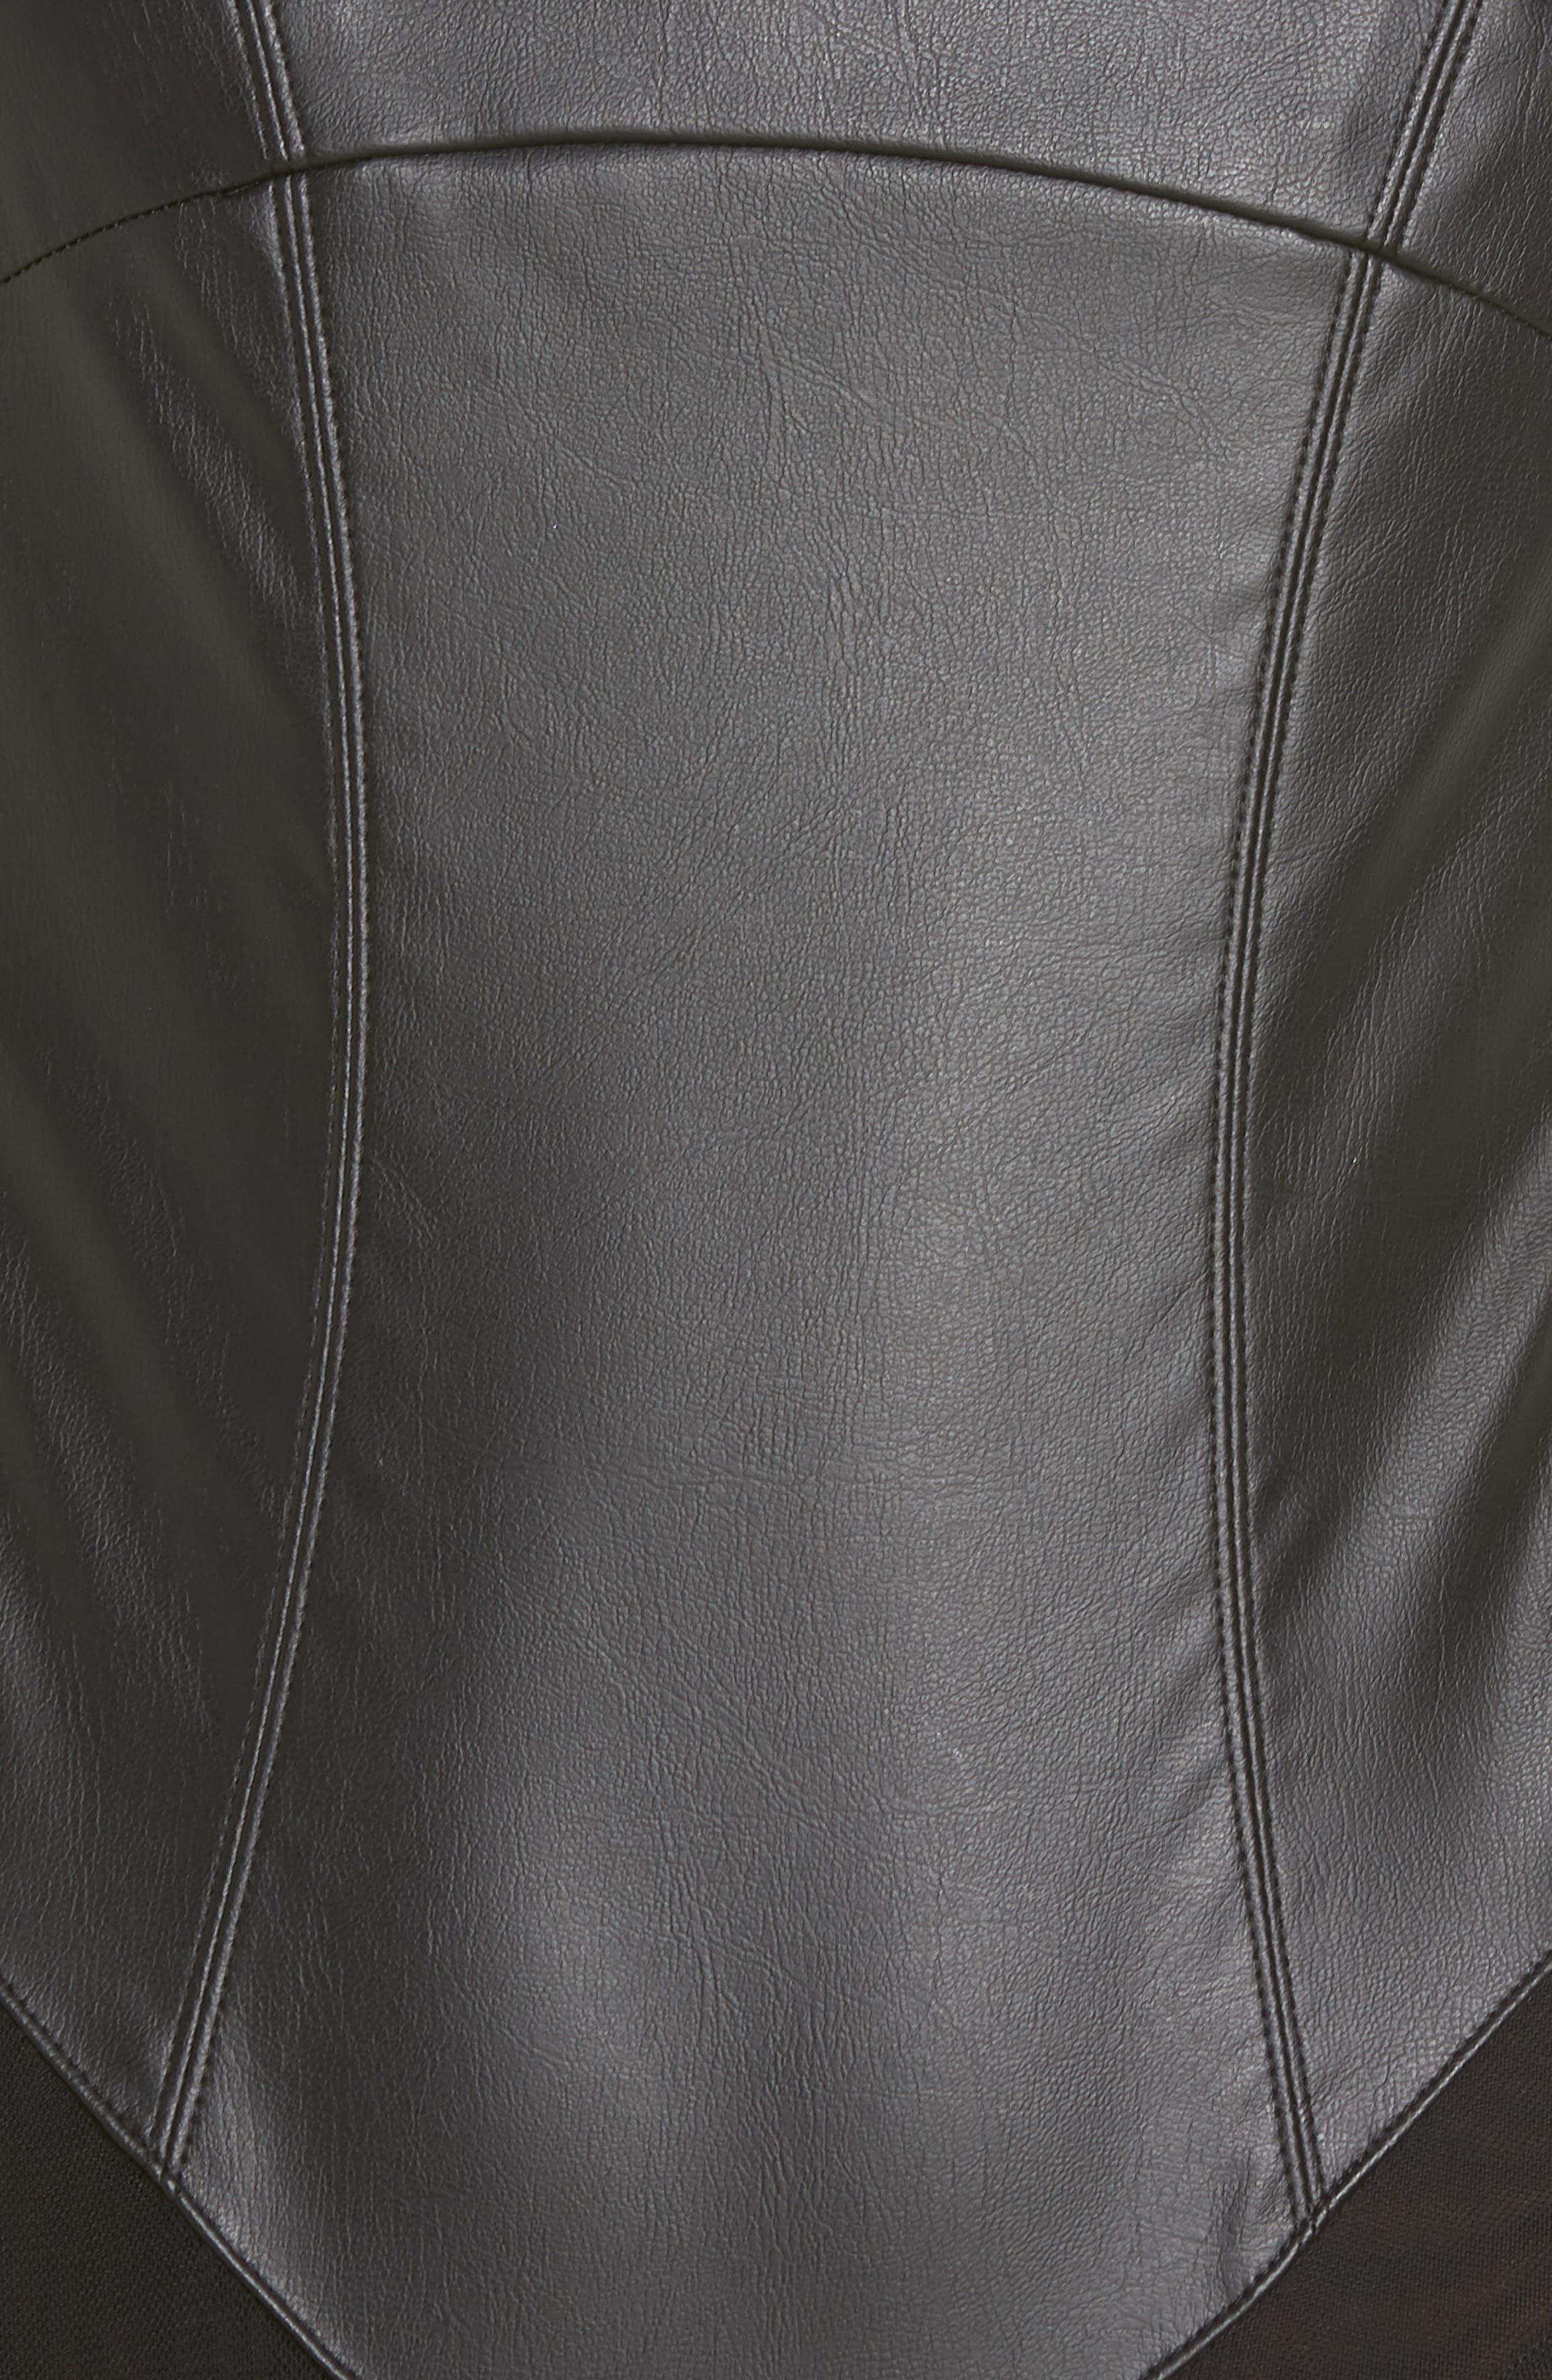 FREE PEOPLE, She's A Vegan Faux Leather Bodysuit, Alternate thumbnail 5, color, 001